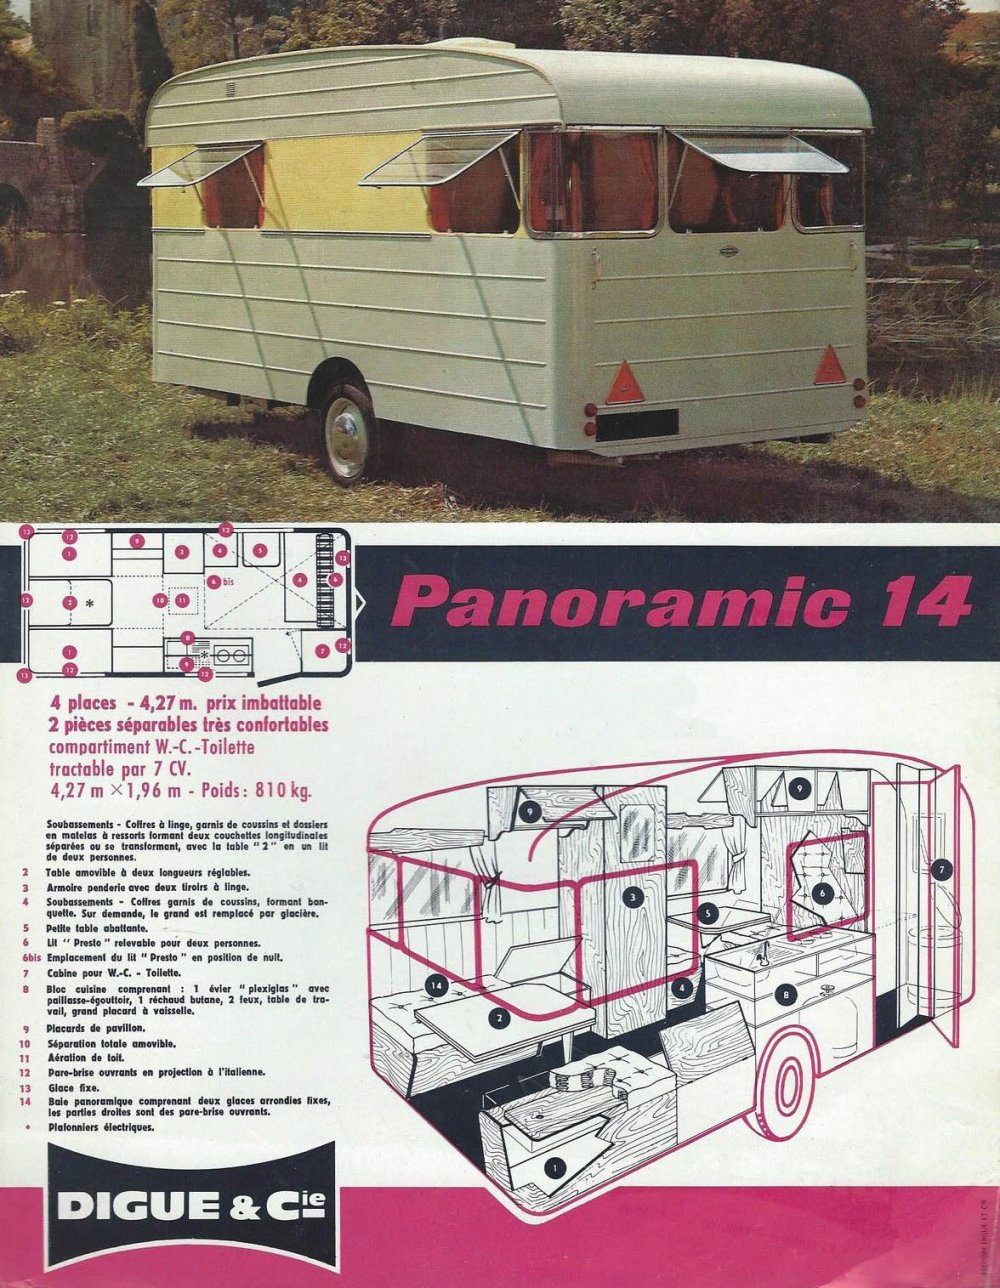 1421238145_panoramic14_1960.jpg